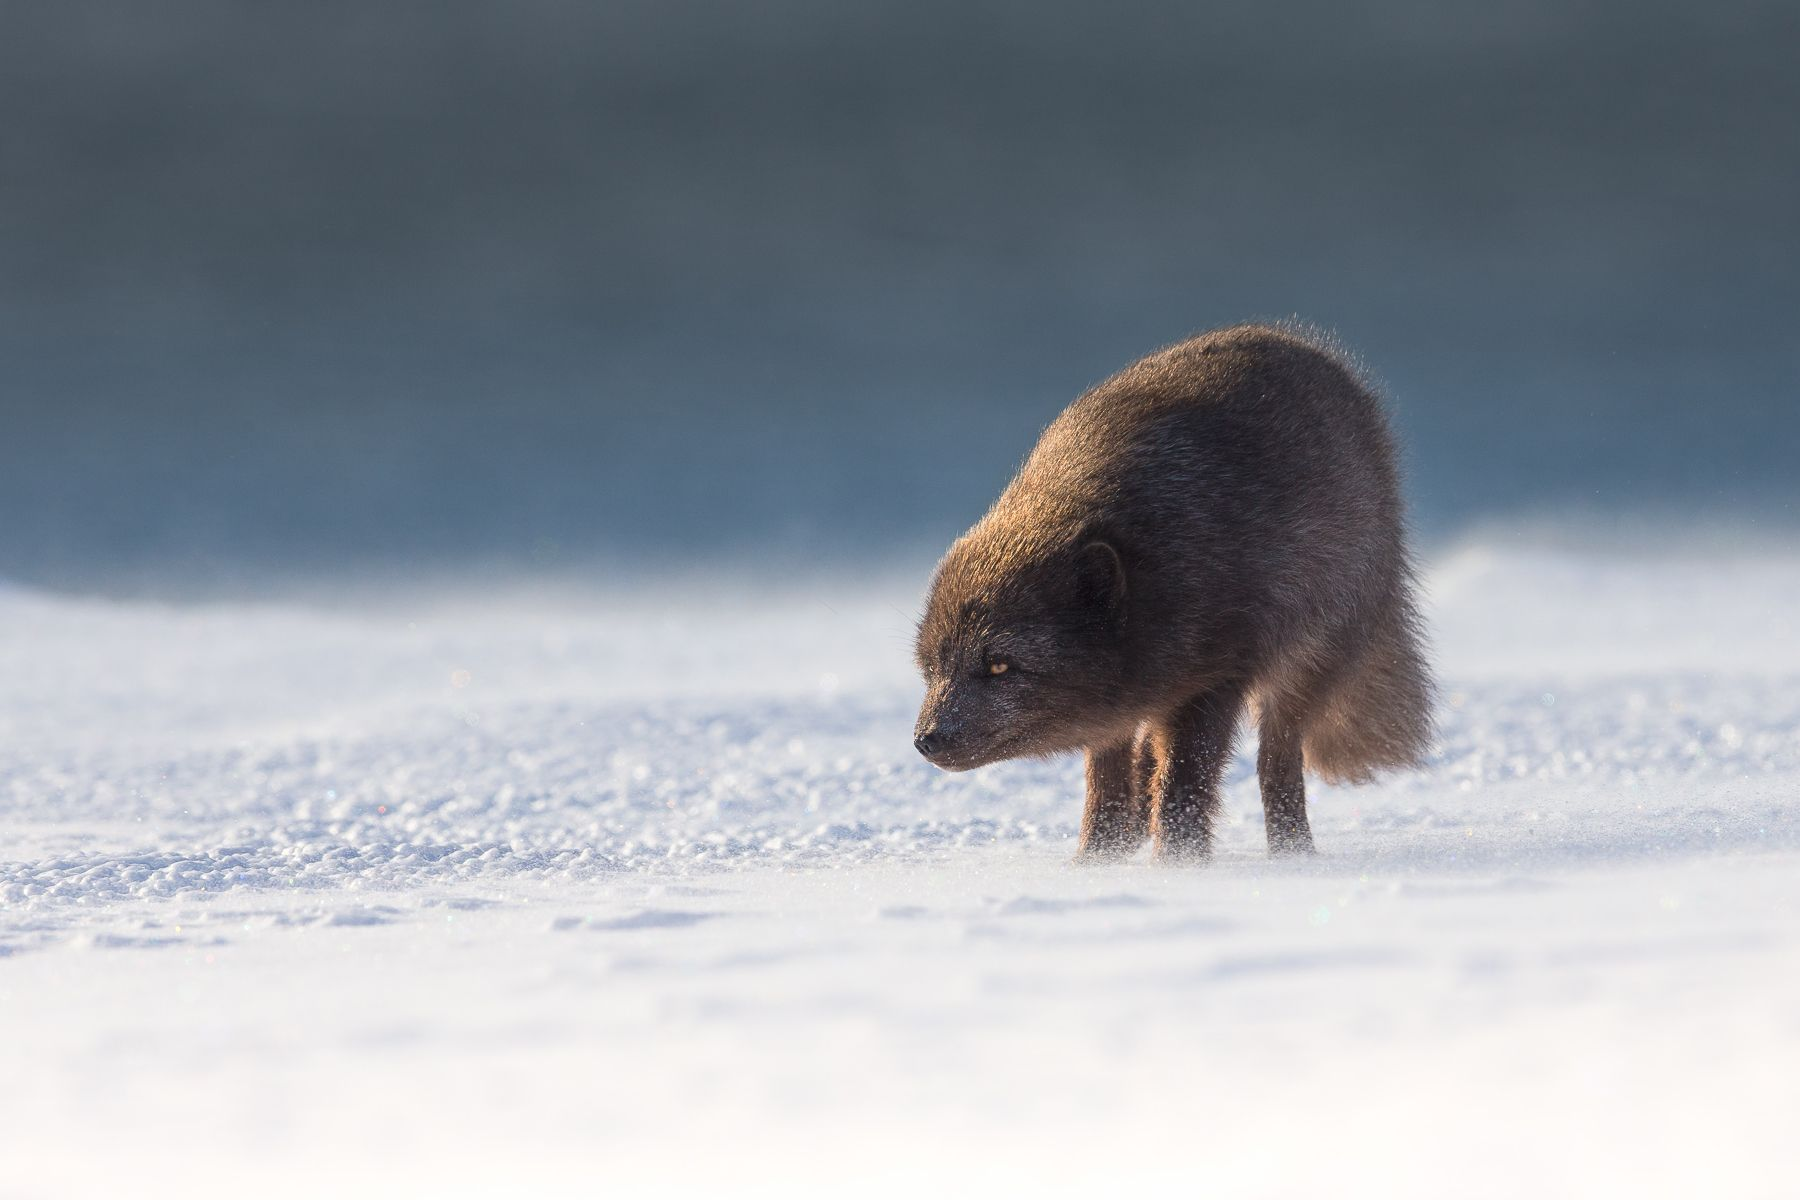 ArcticFoxesWinter2018.jpg